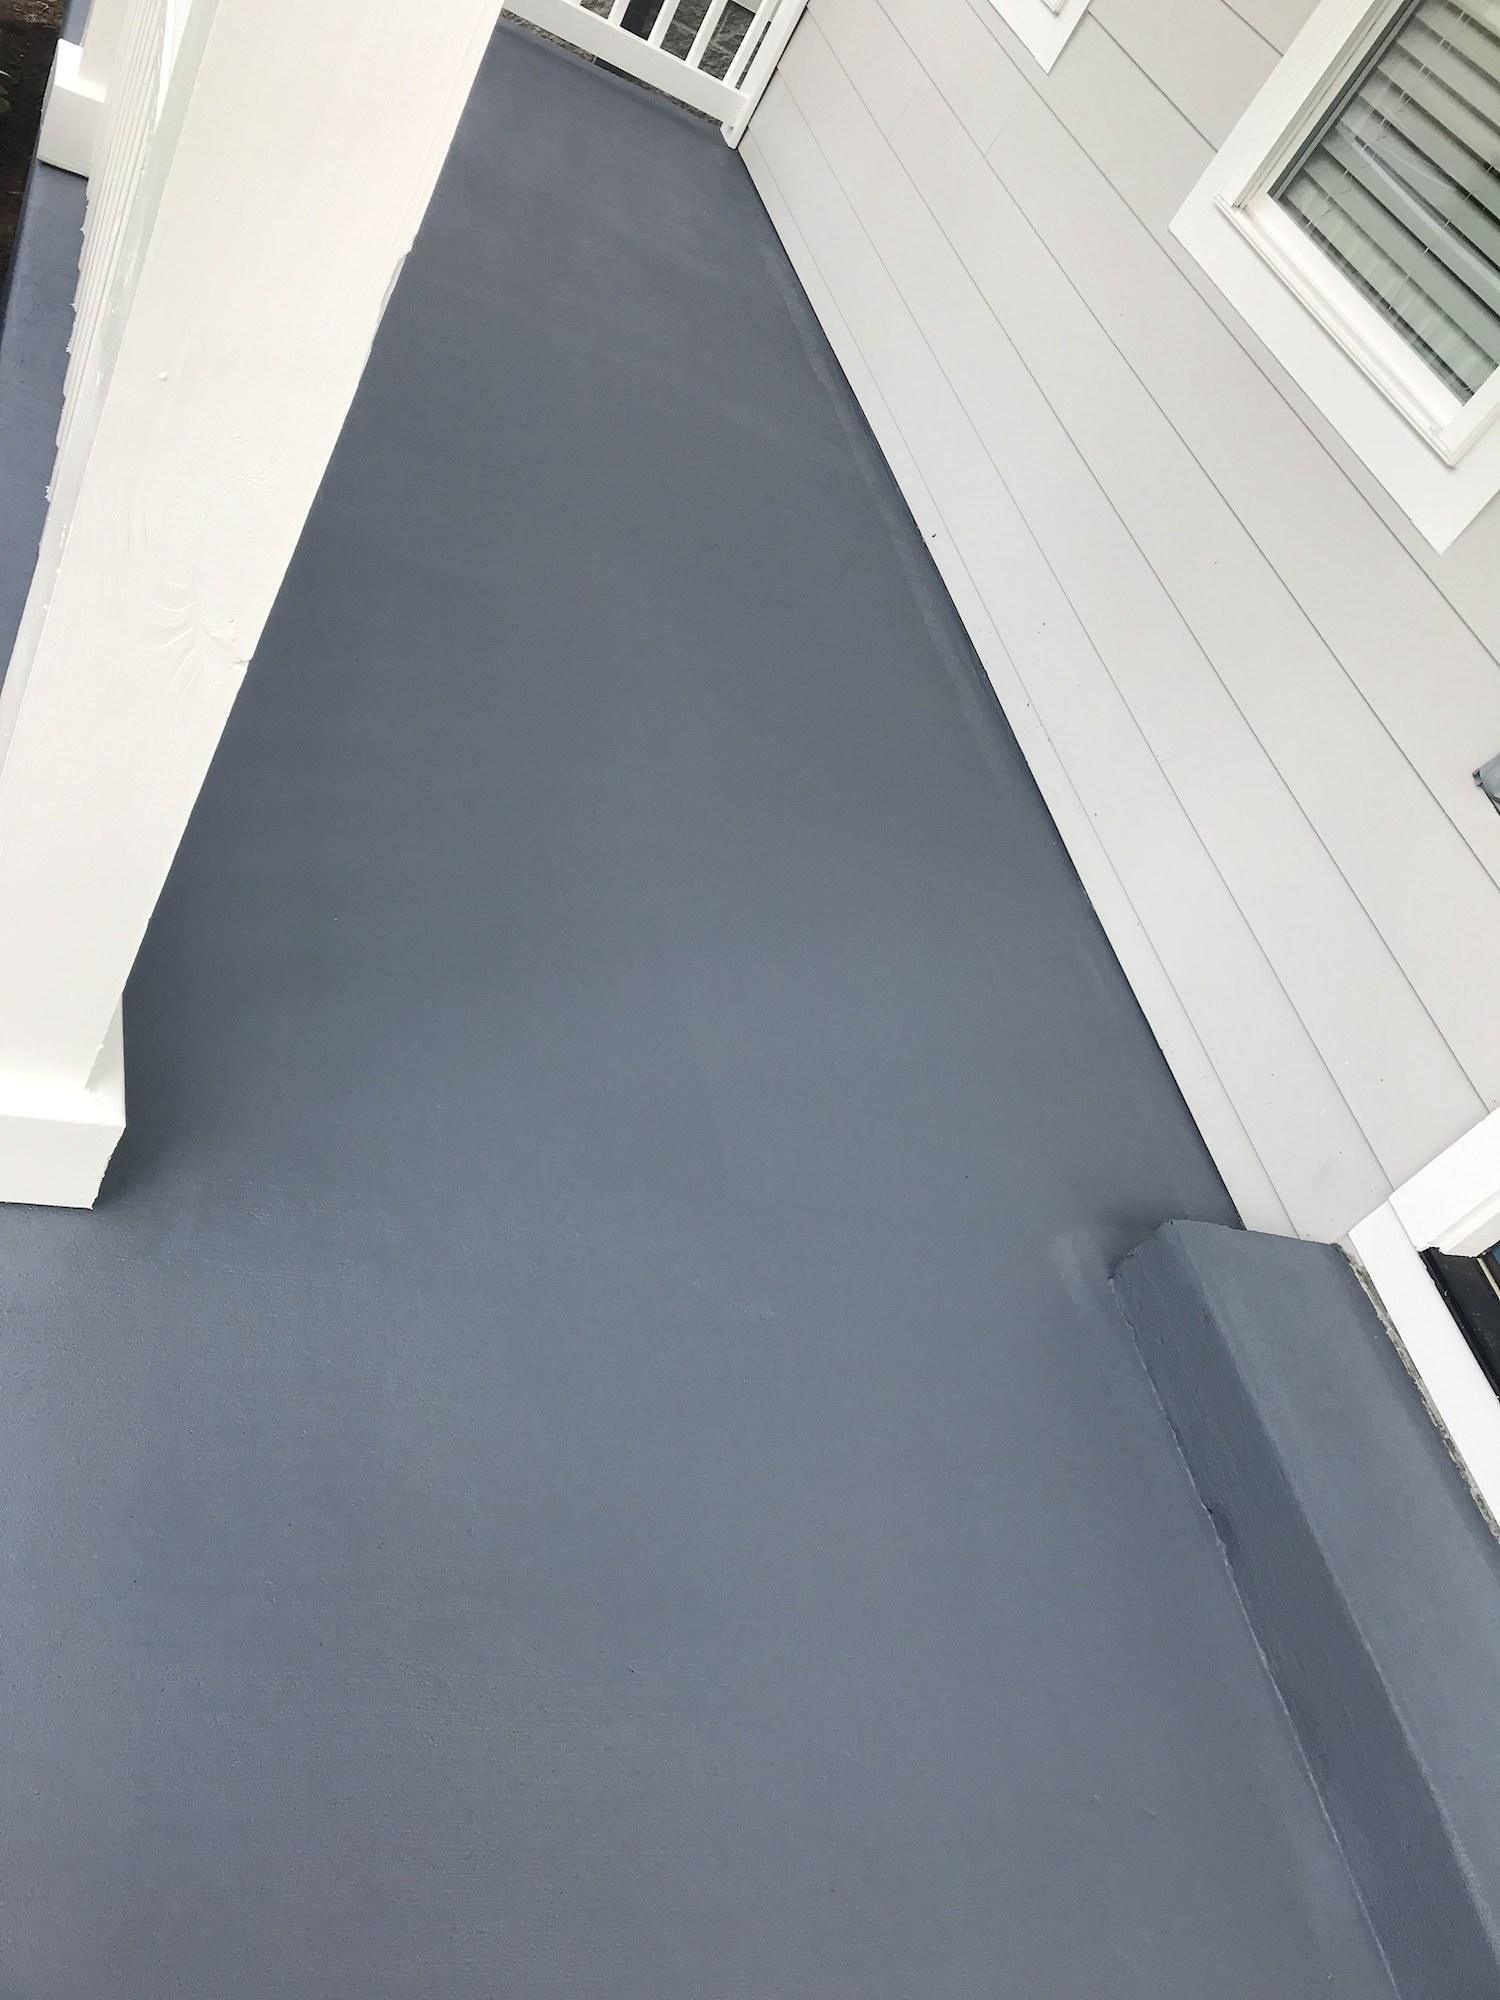 exterior painting in Nashville 4.jpg